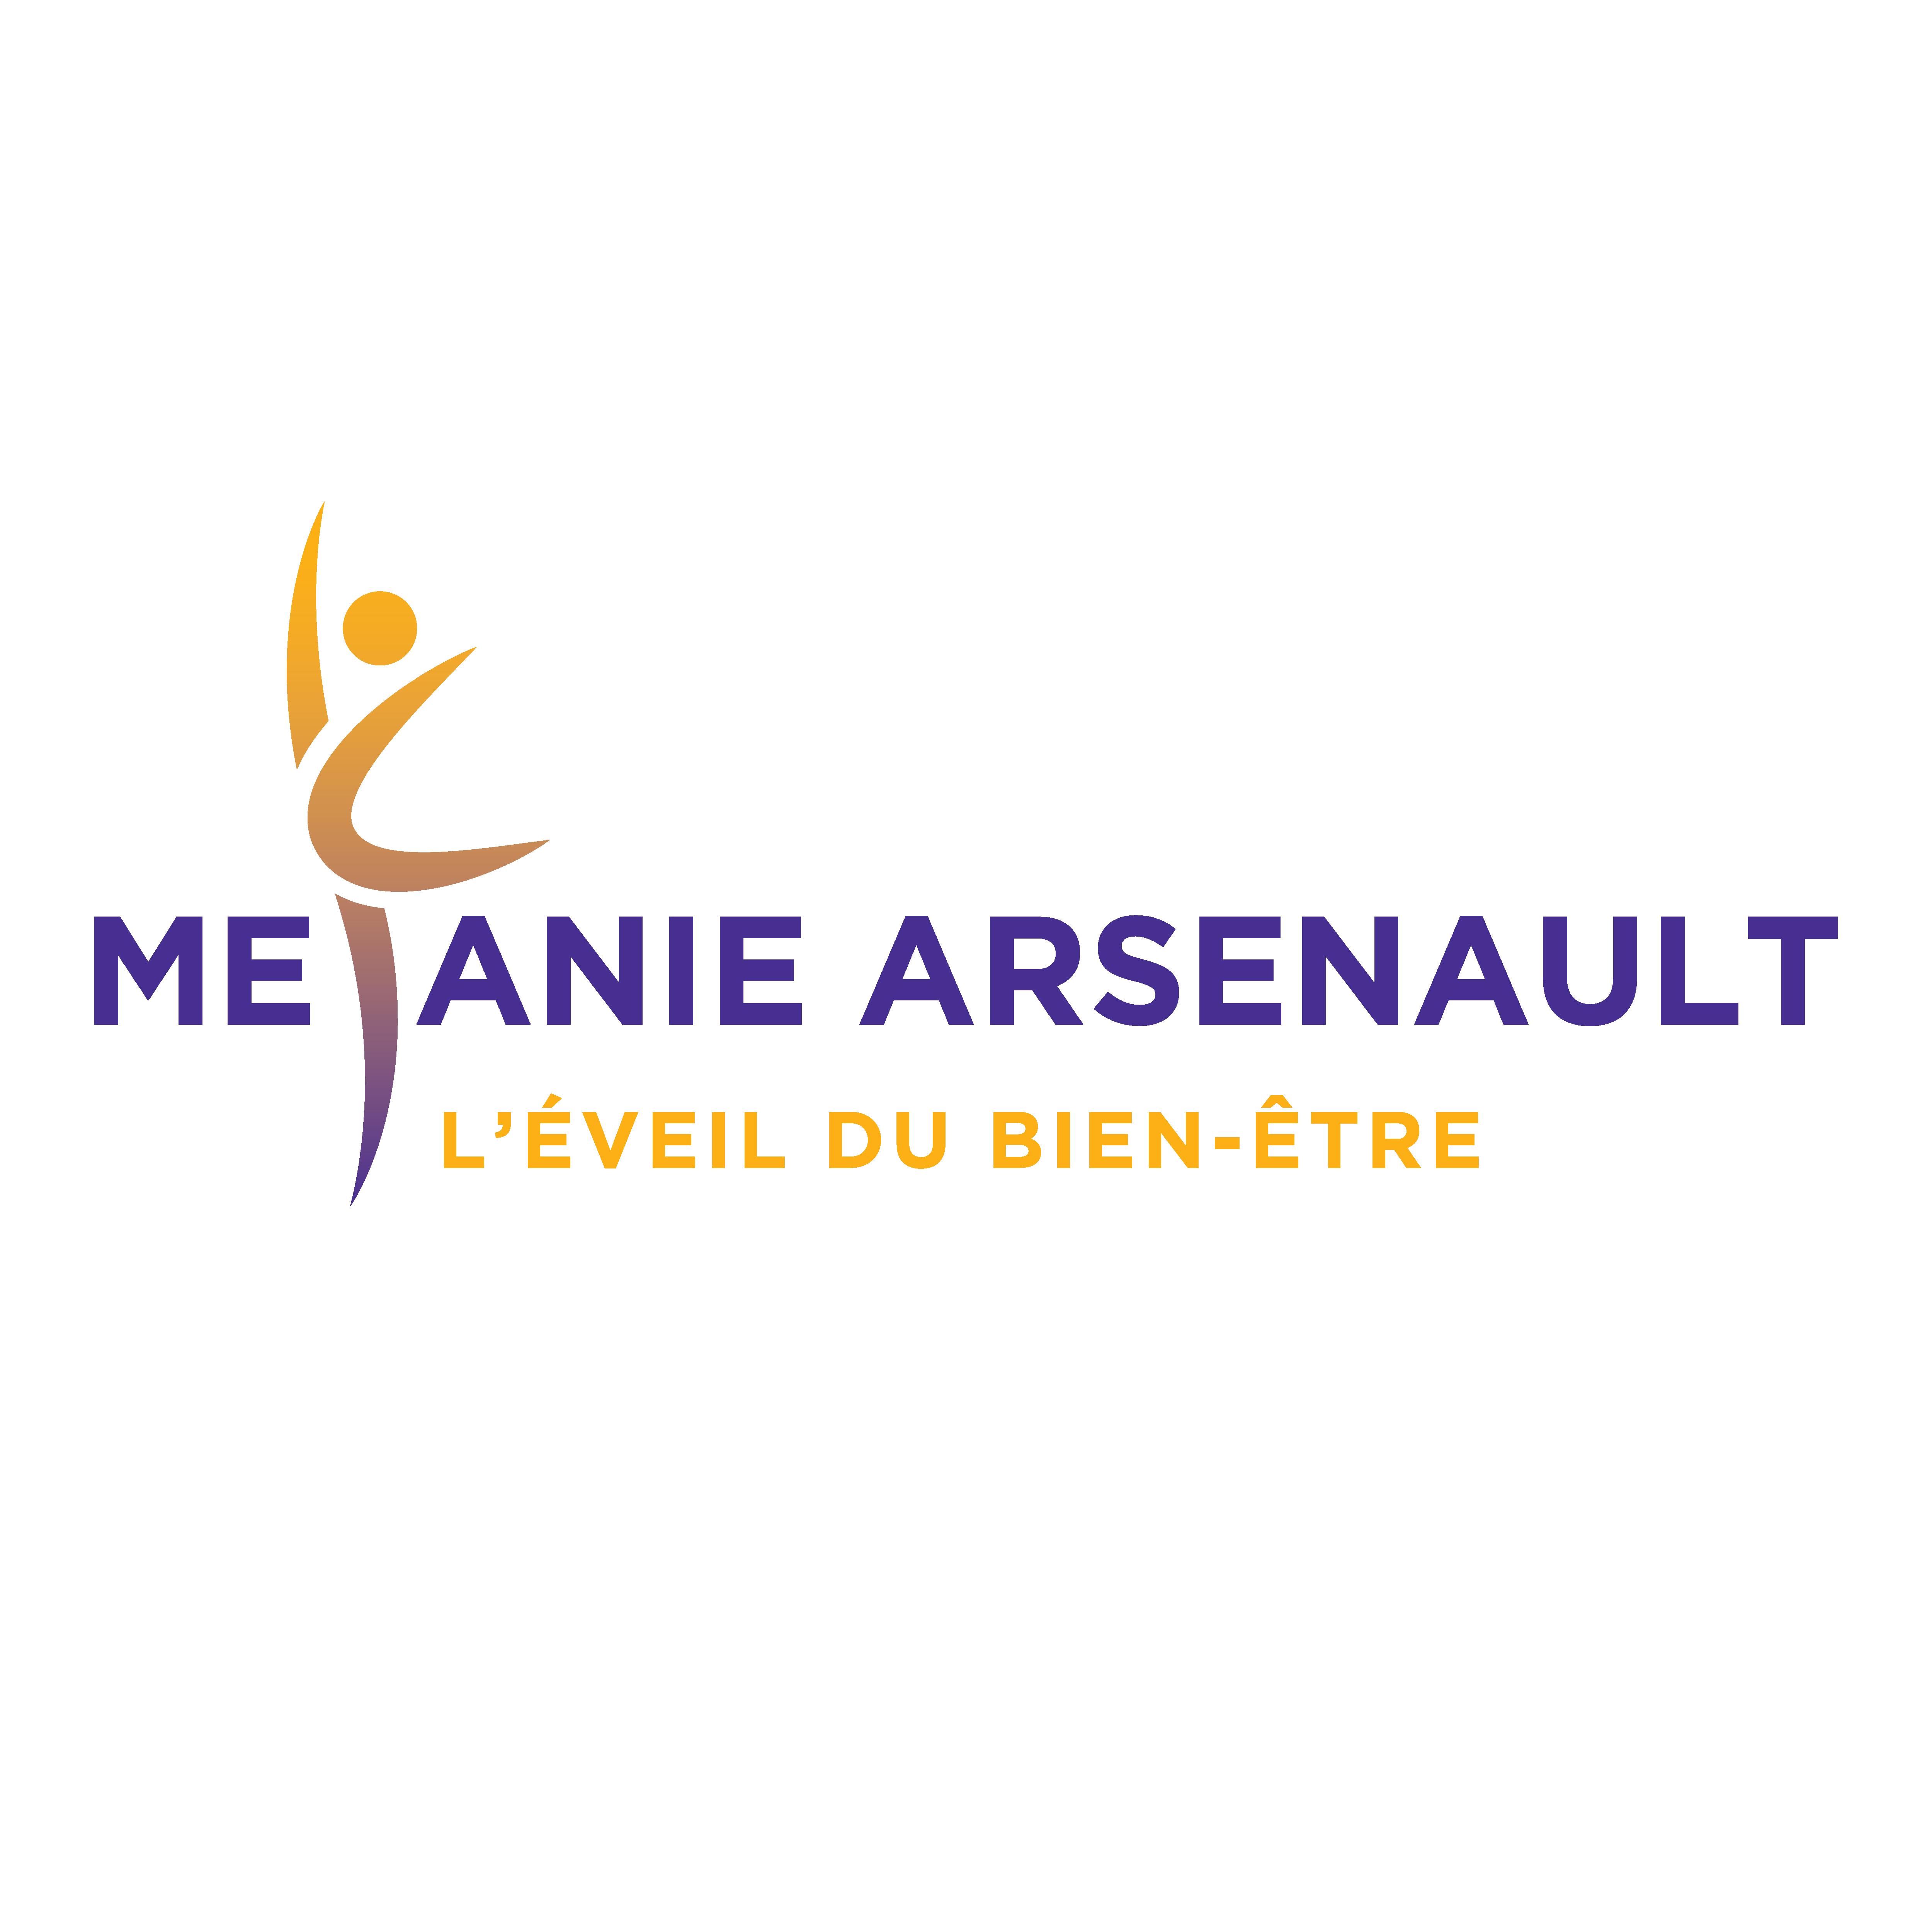 Sophrologie Mélanie Arsenault